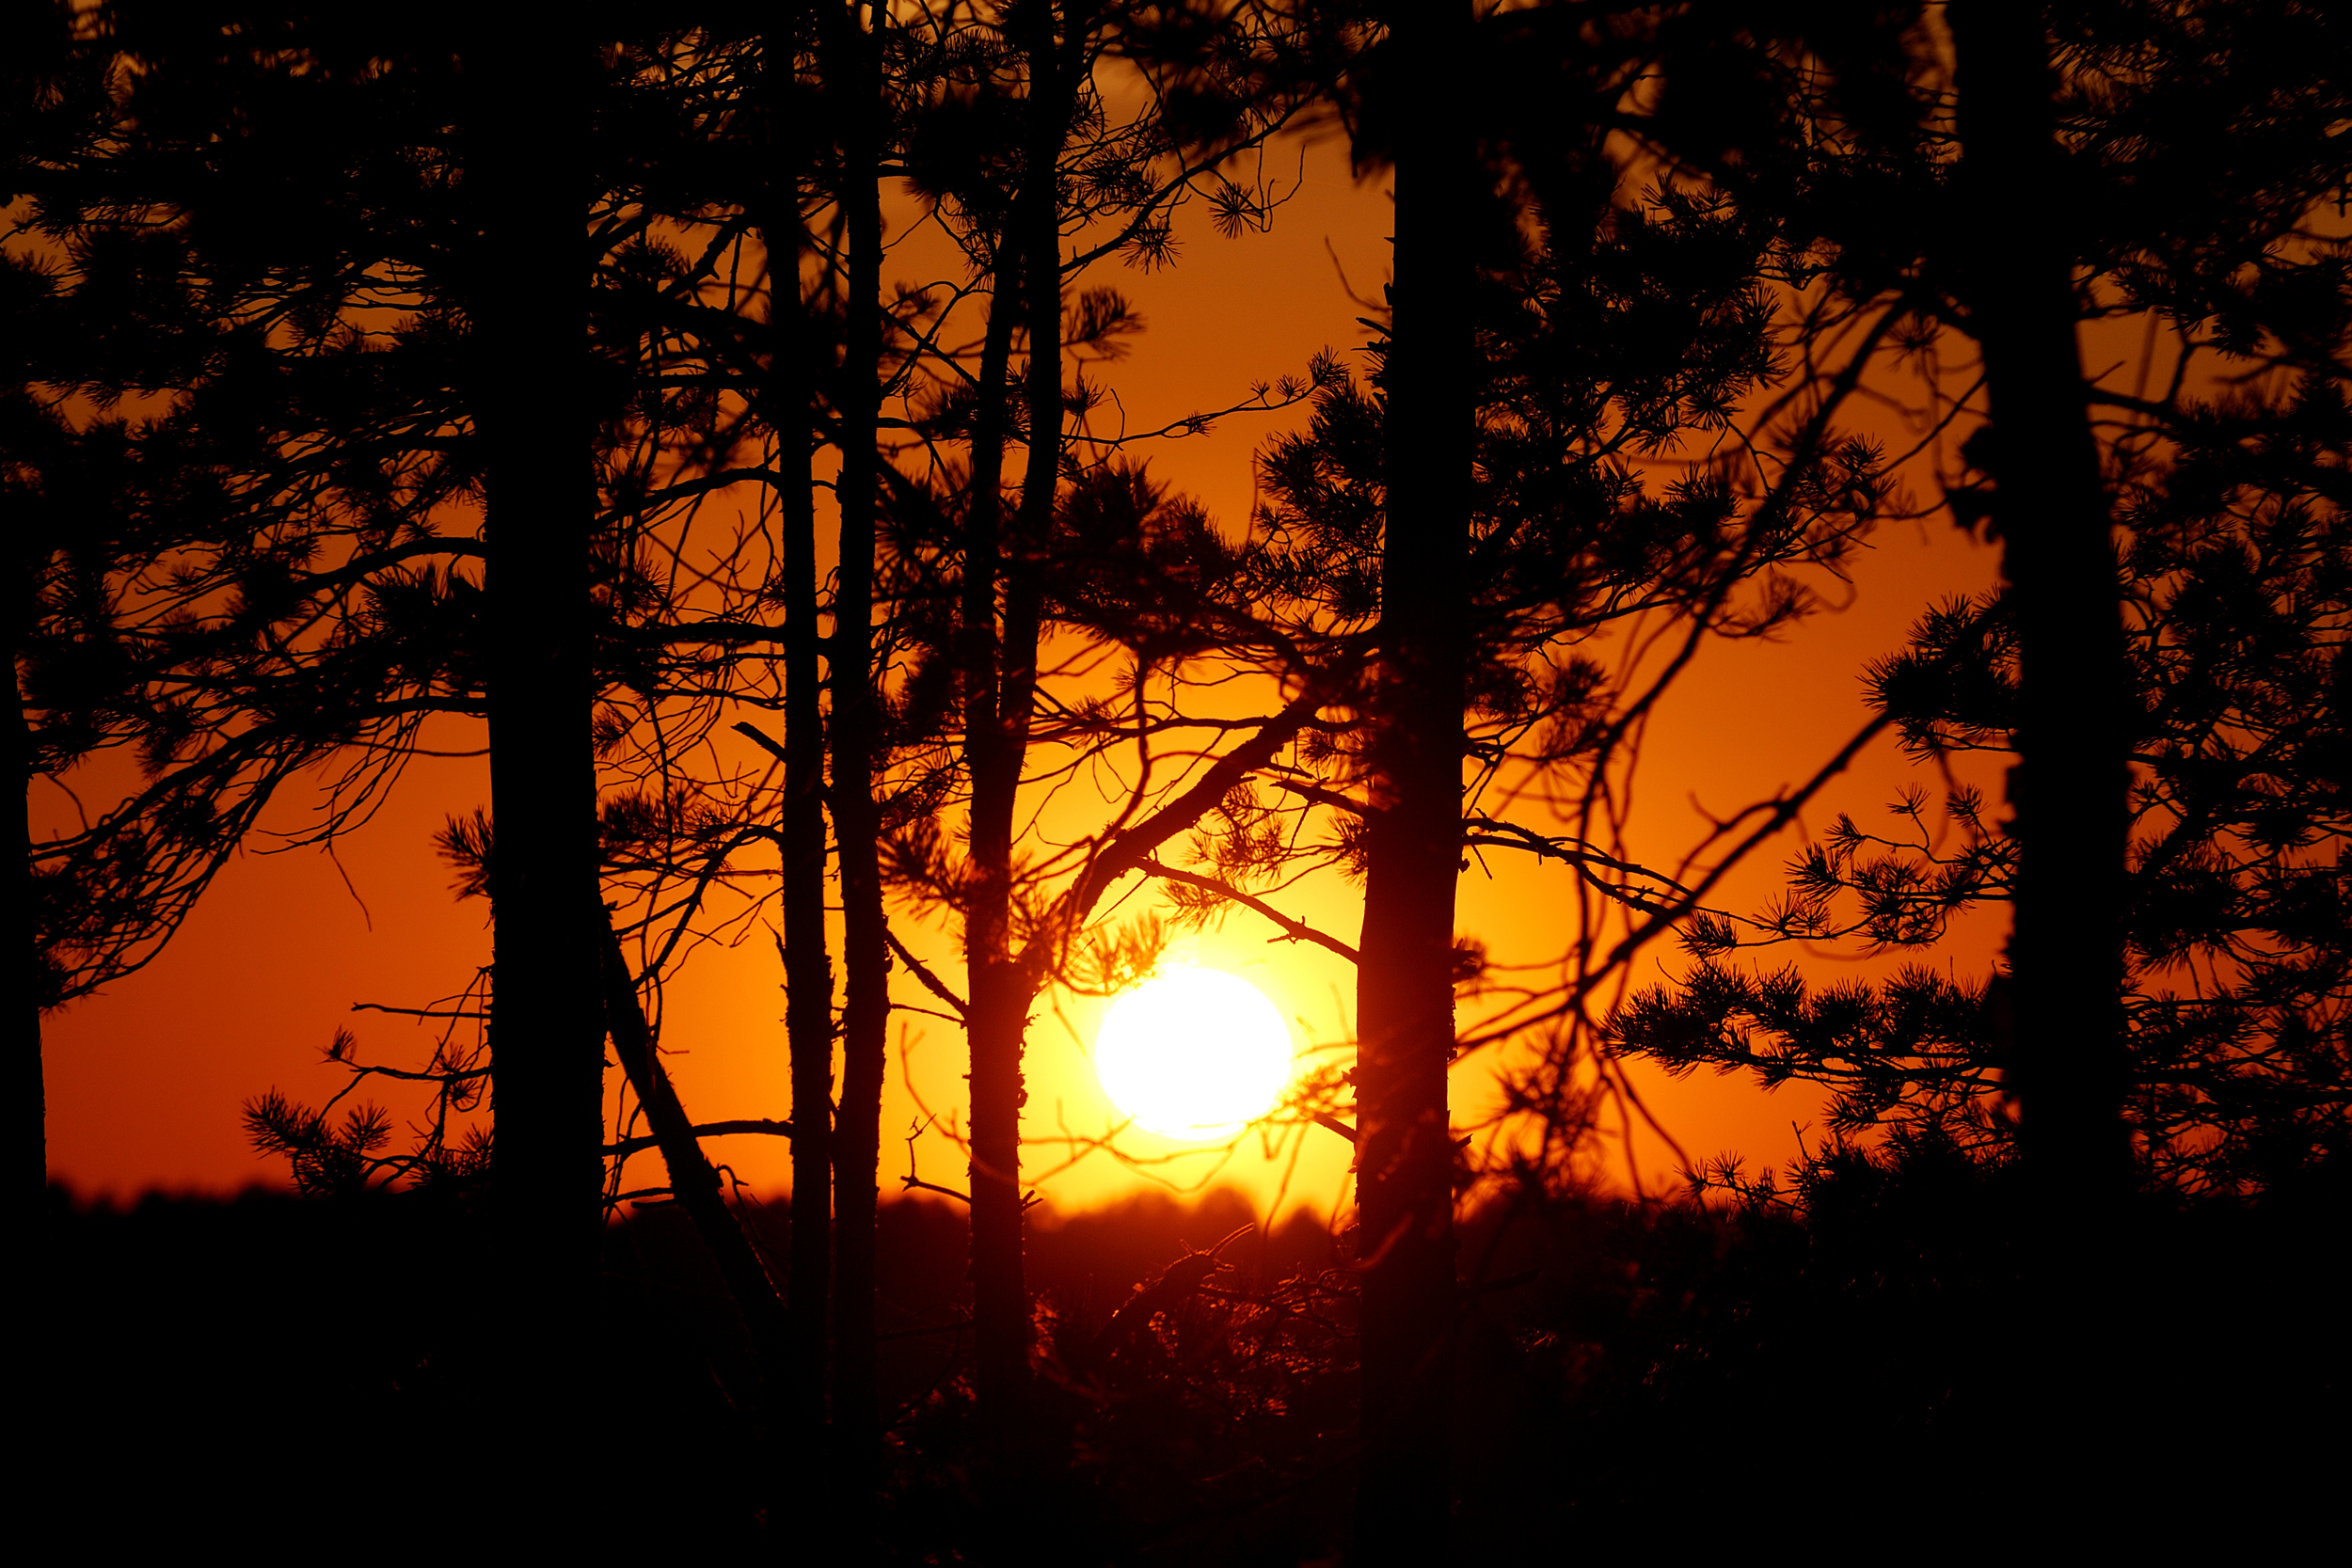 Tree silhouettes against orange sunset